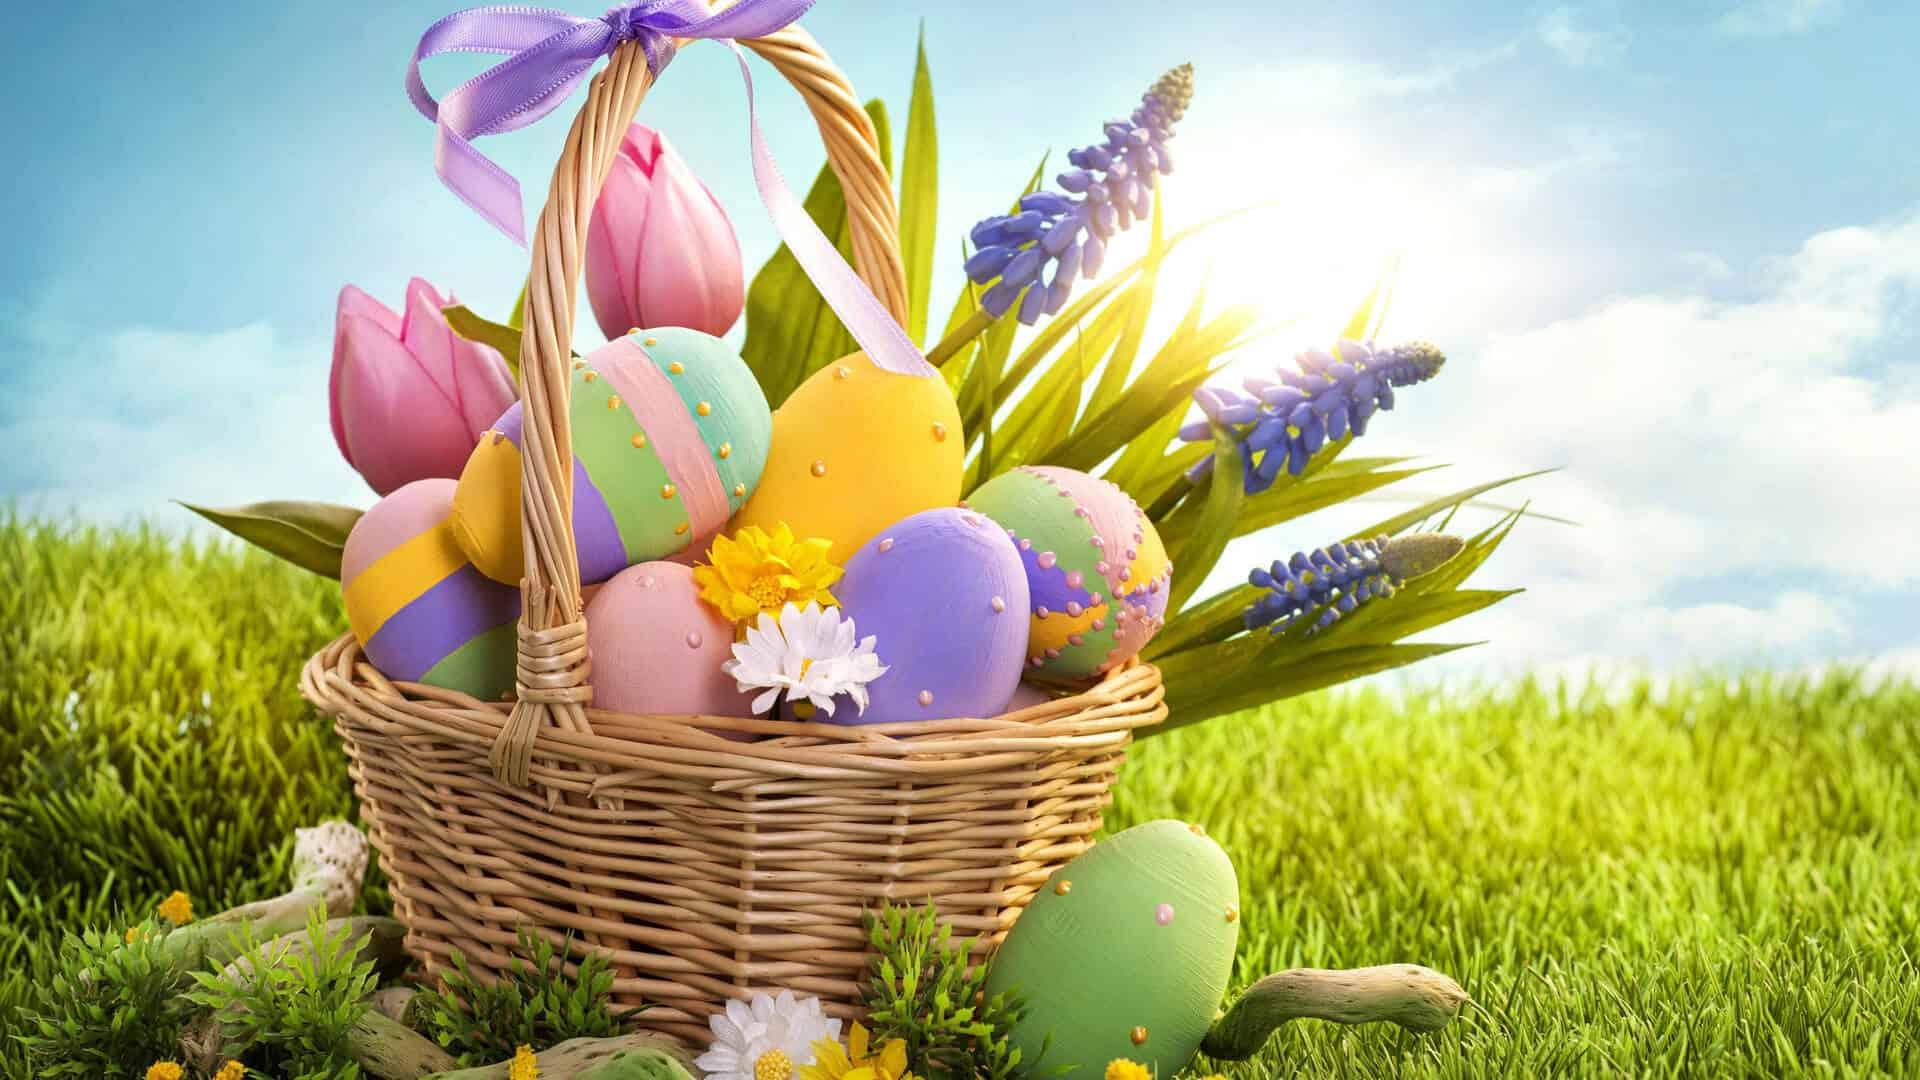 20 Best Easter Egg Wallpapers